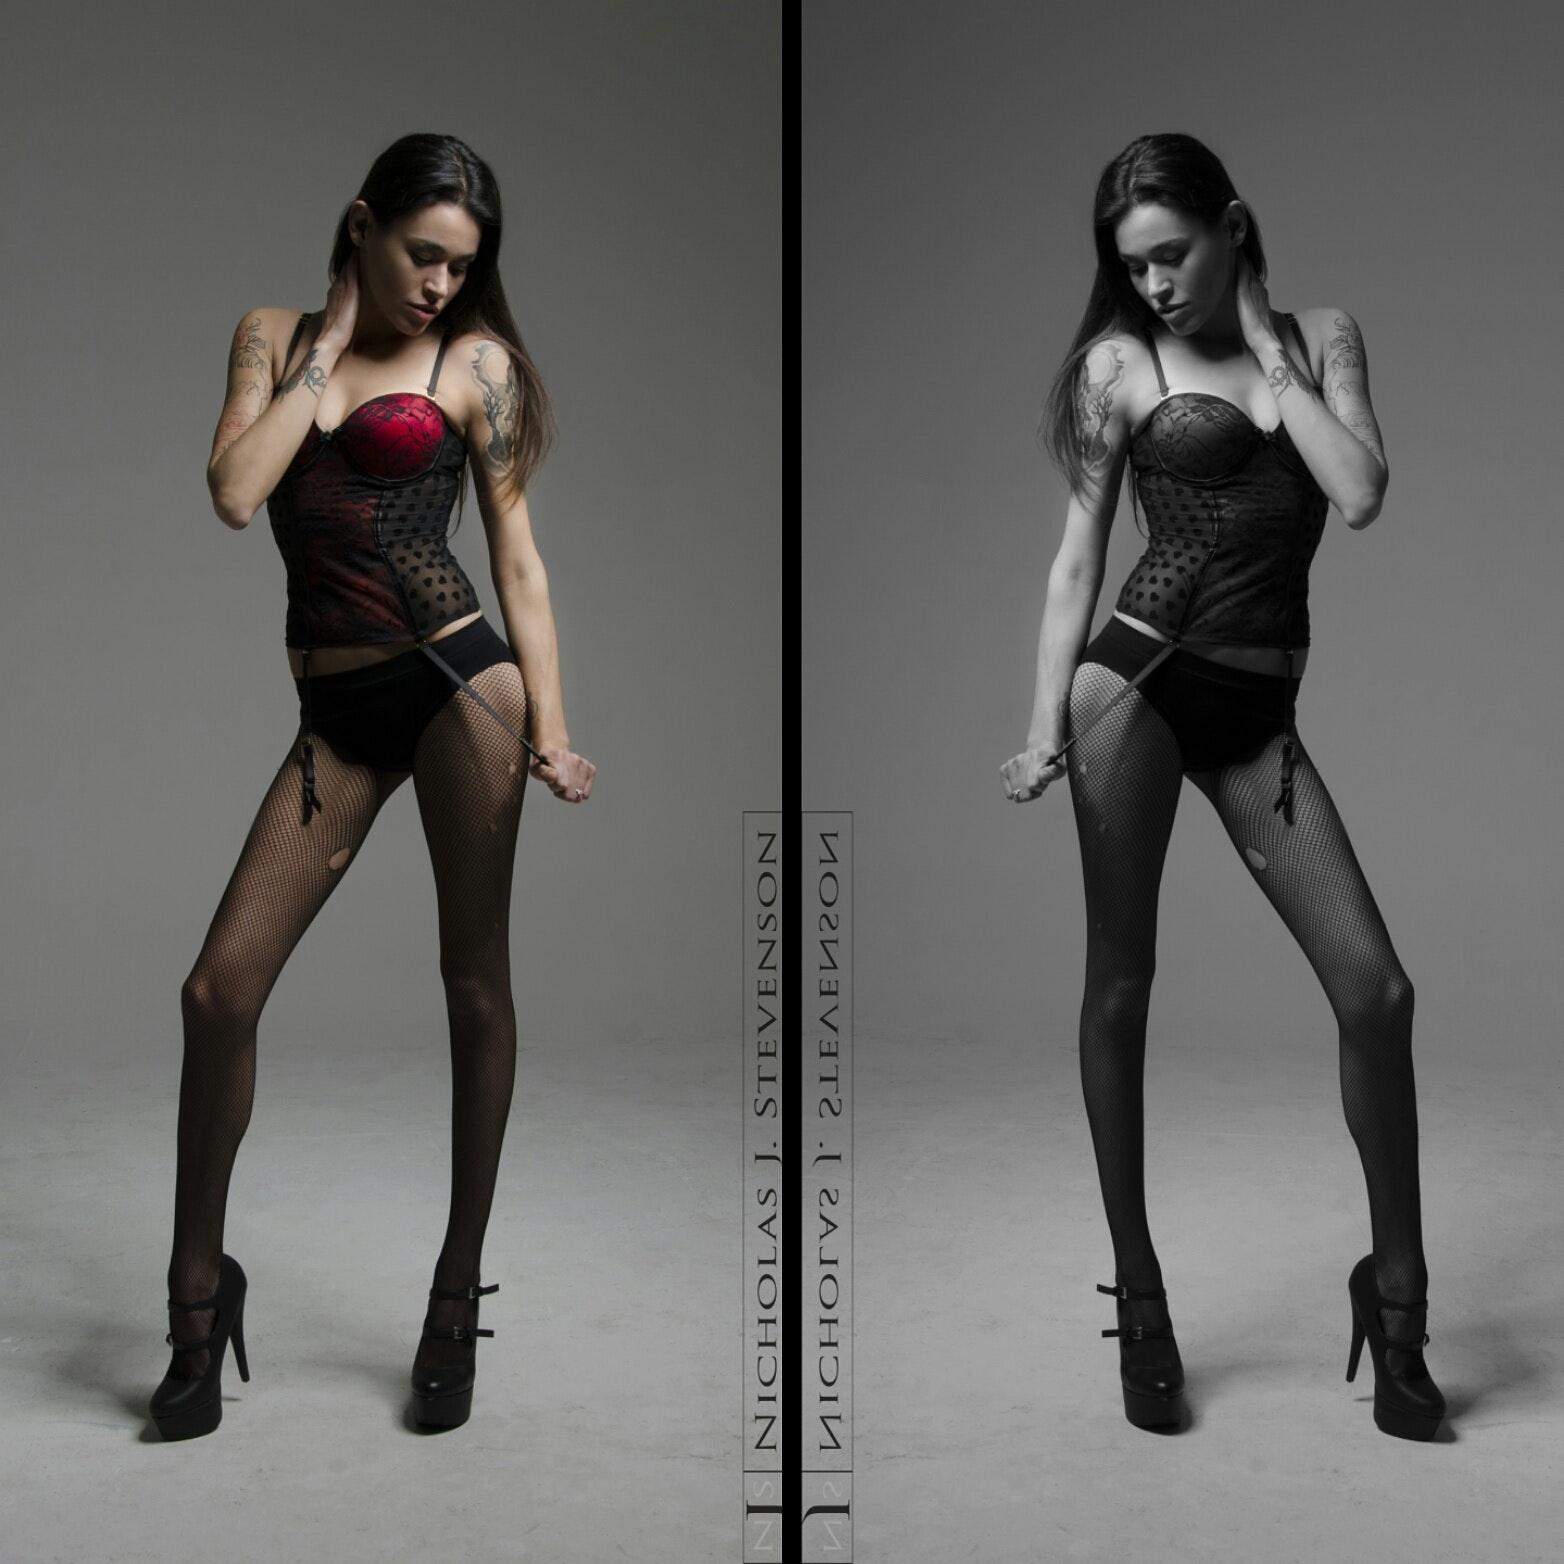 Cat Lopez's Model portfolio